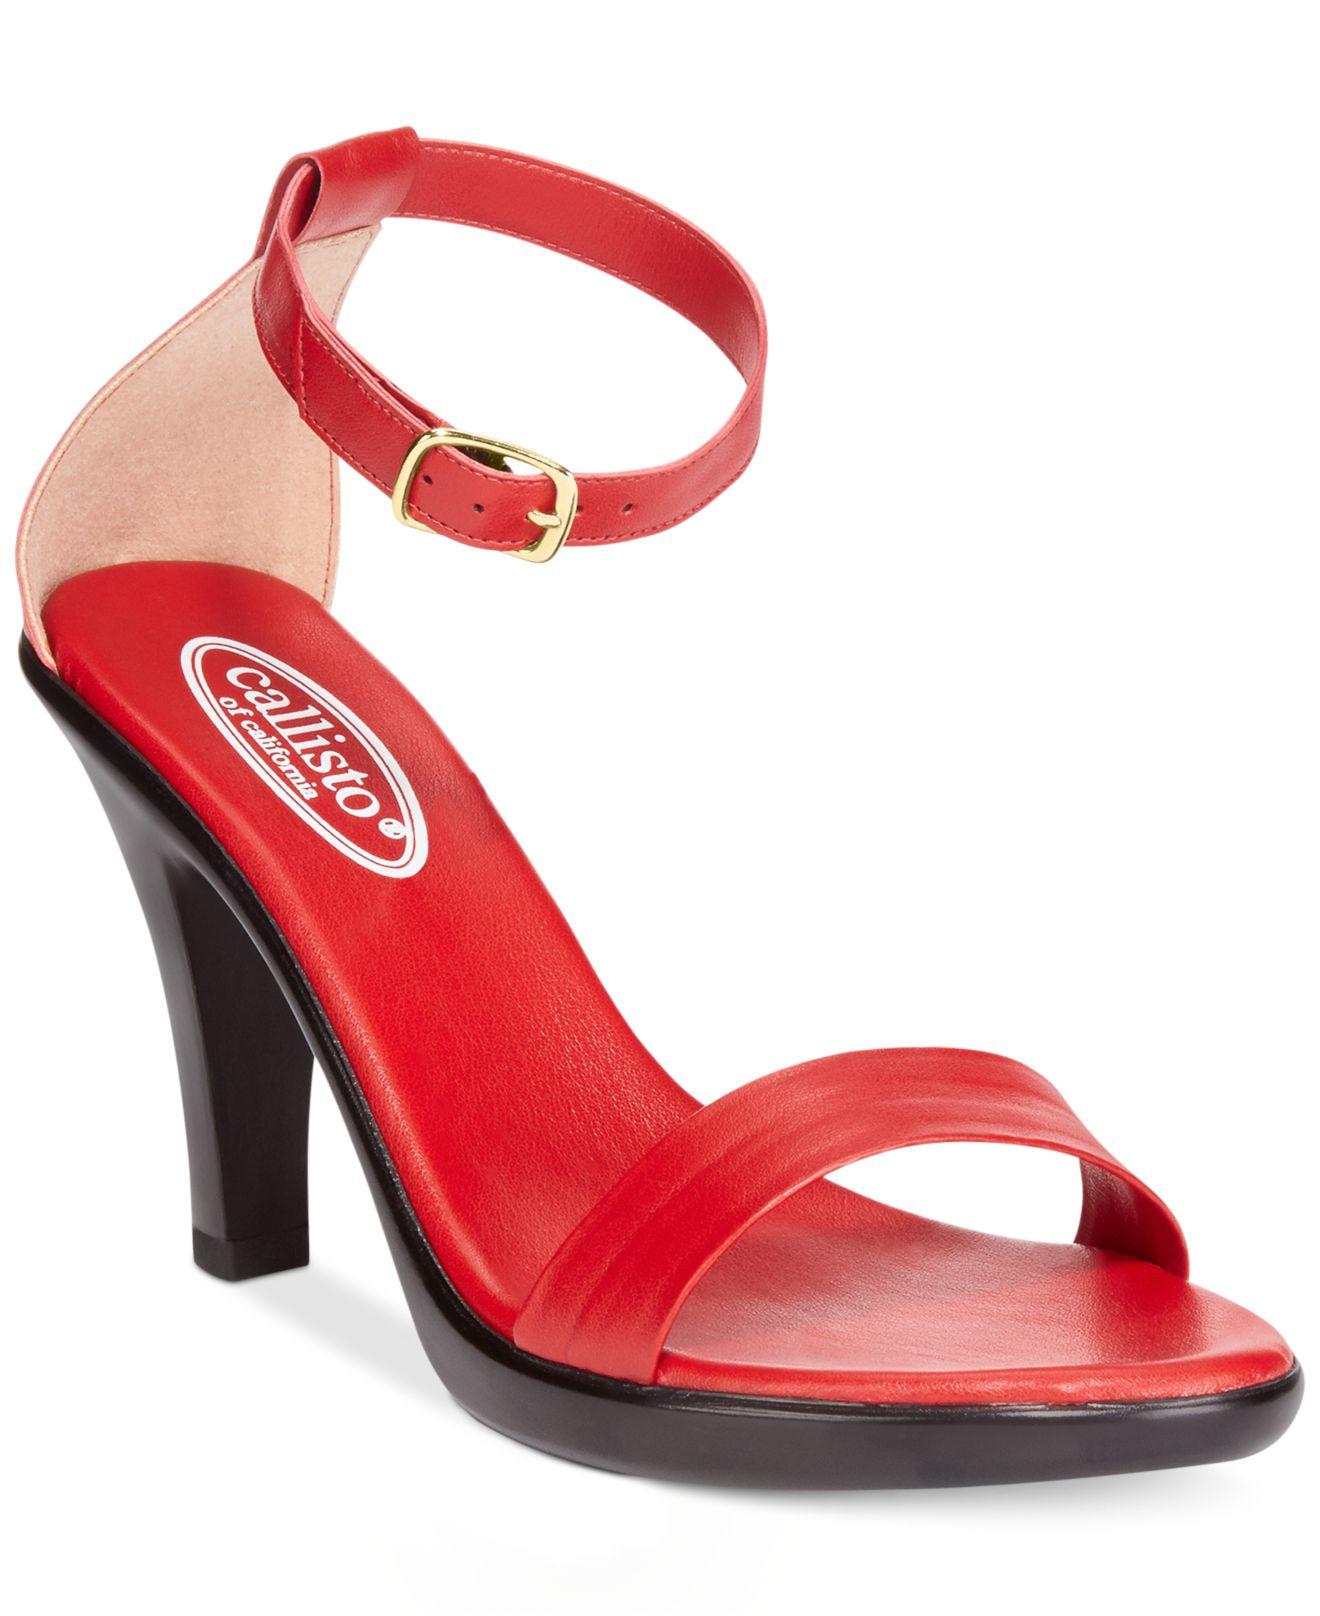 dc1039da7498 Lyst - Callisto Mantra Ankle Strap Sandals in Red